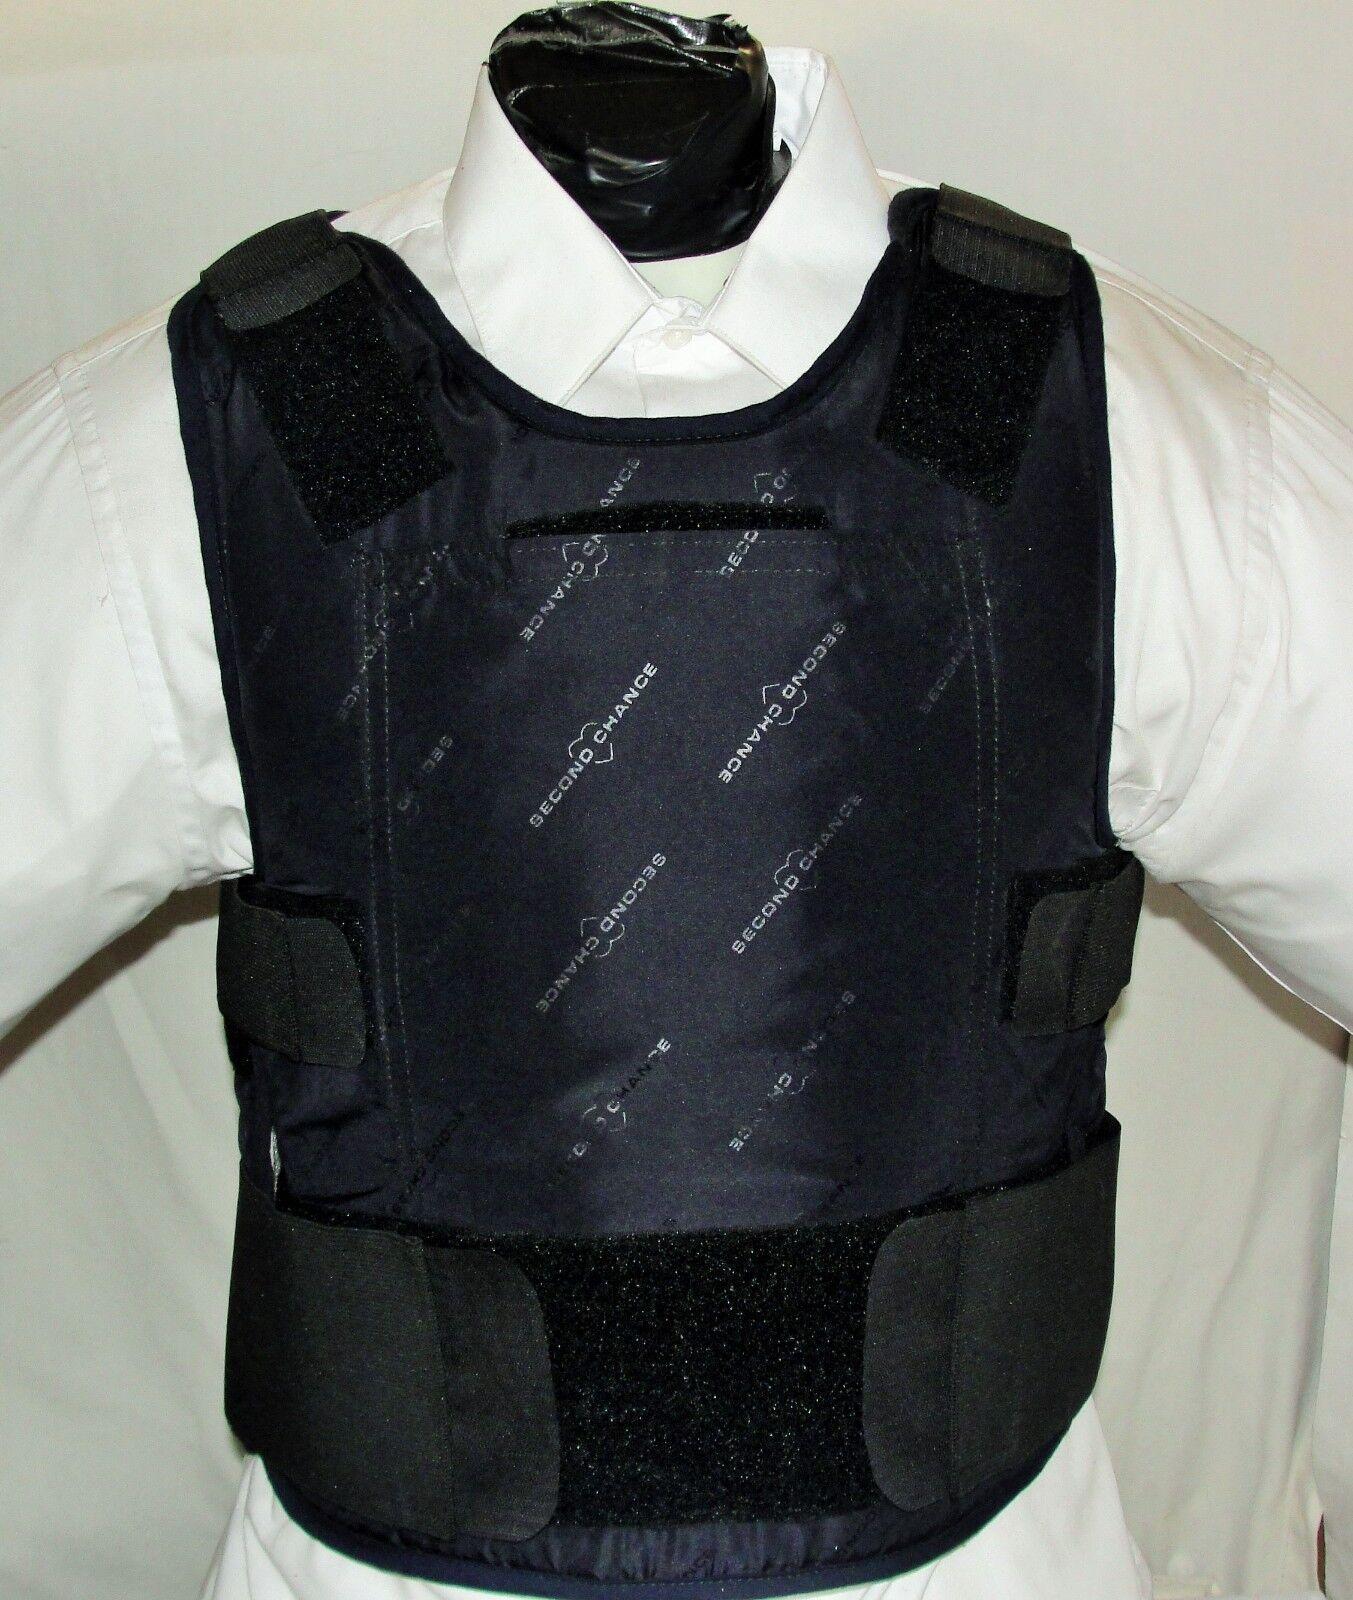 Concealable Body Armor Carrier BulletProof Vest with Inserts XXXL IIIA Lo Vis